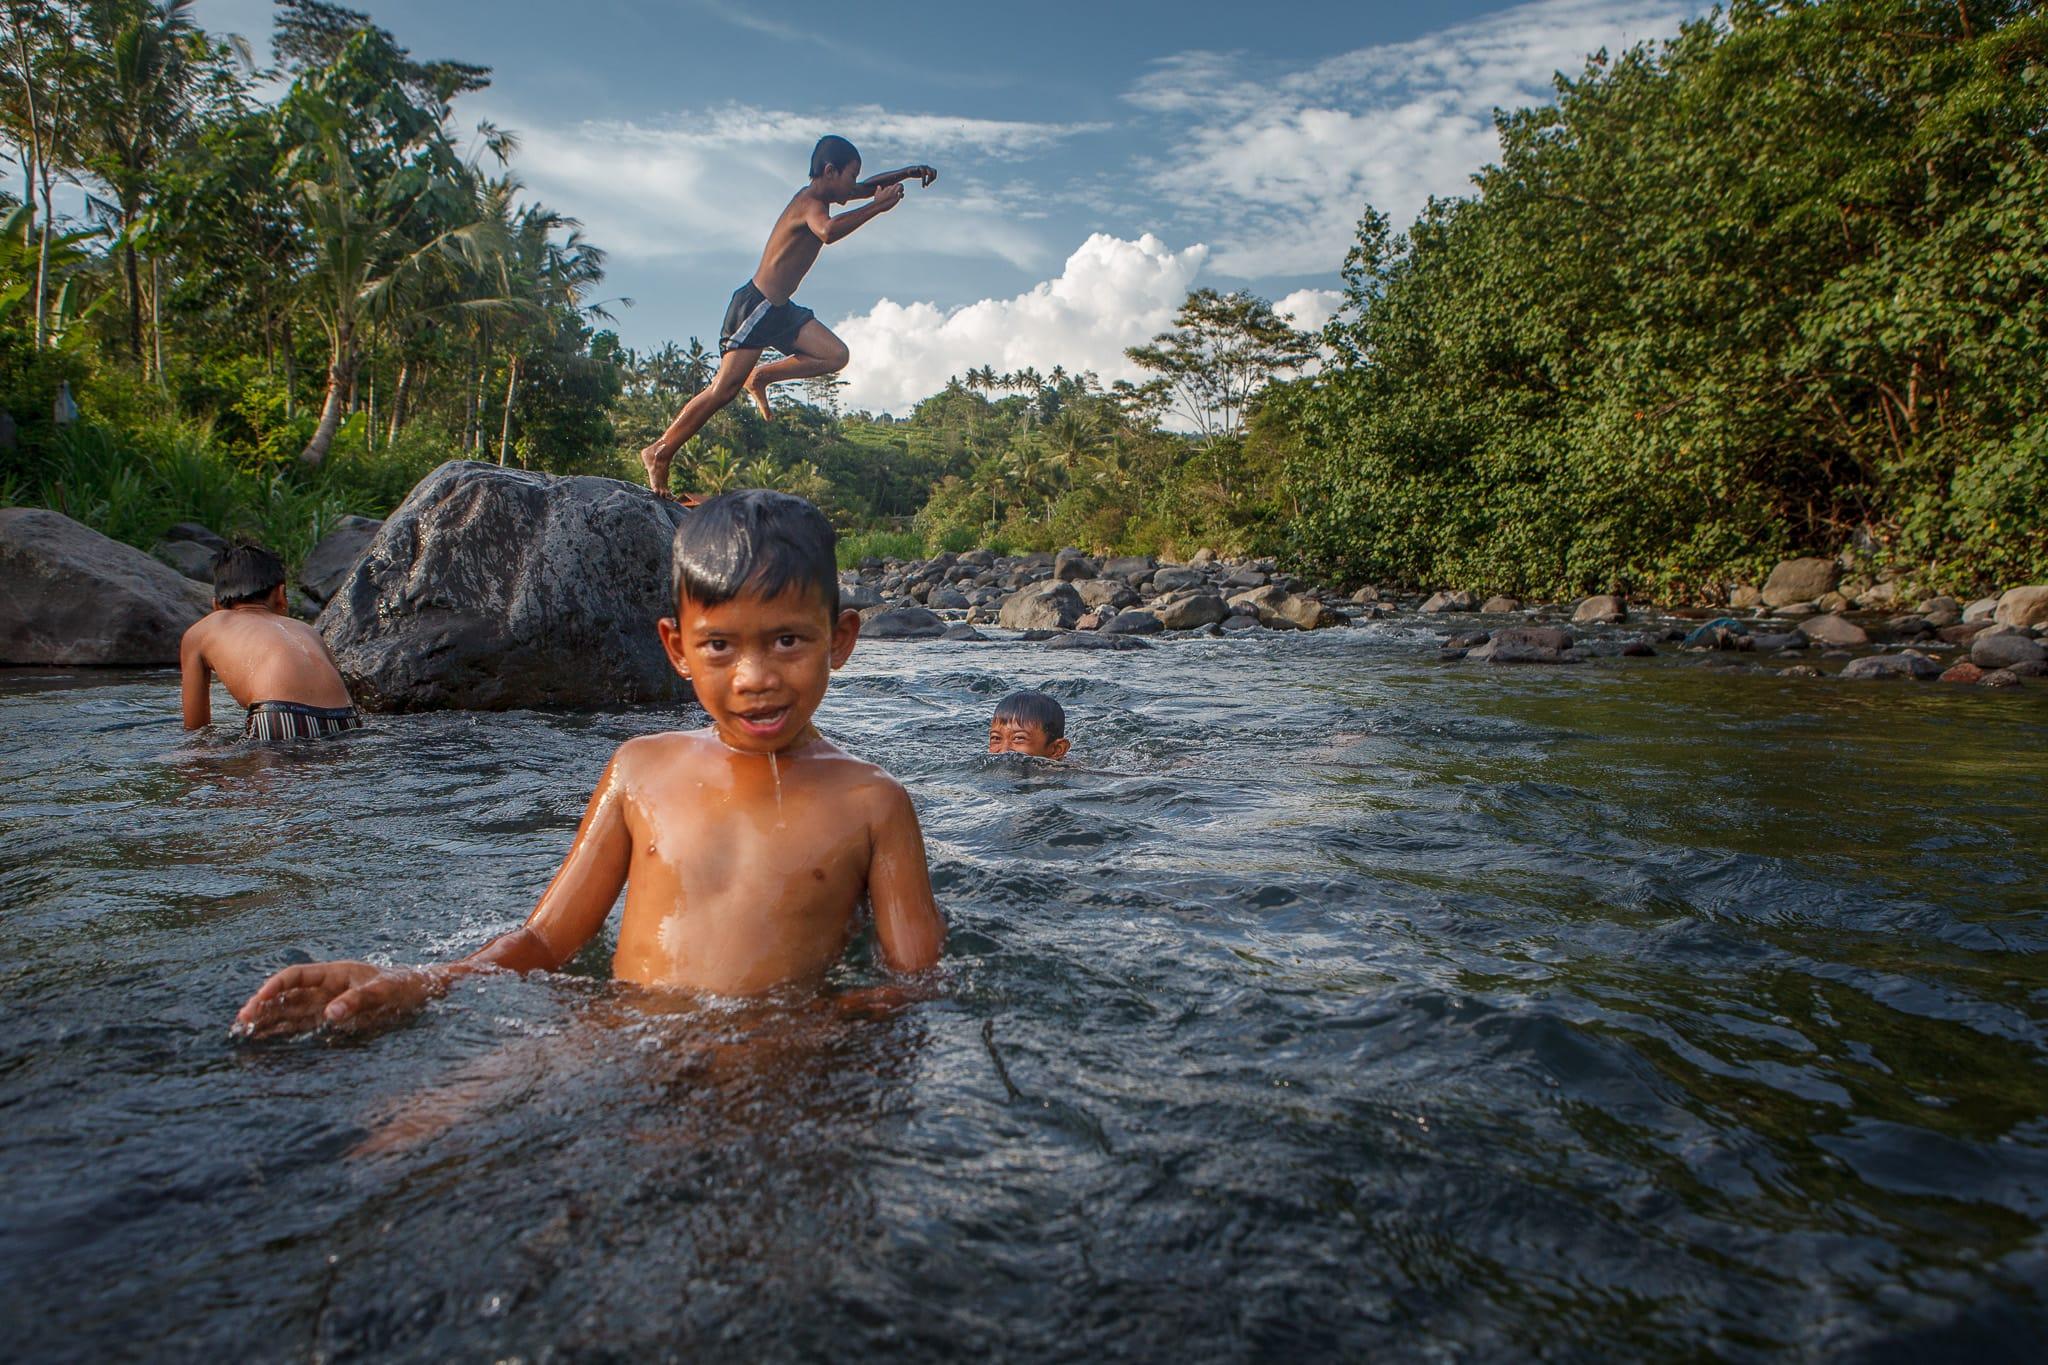 Balinese children playing in the river near Villa Uma Dewi Sri - Cabins for rent - Sidemen - Bali - Indonesia